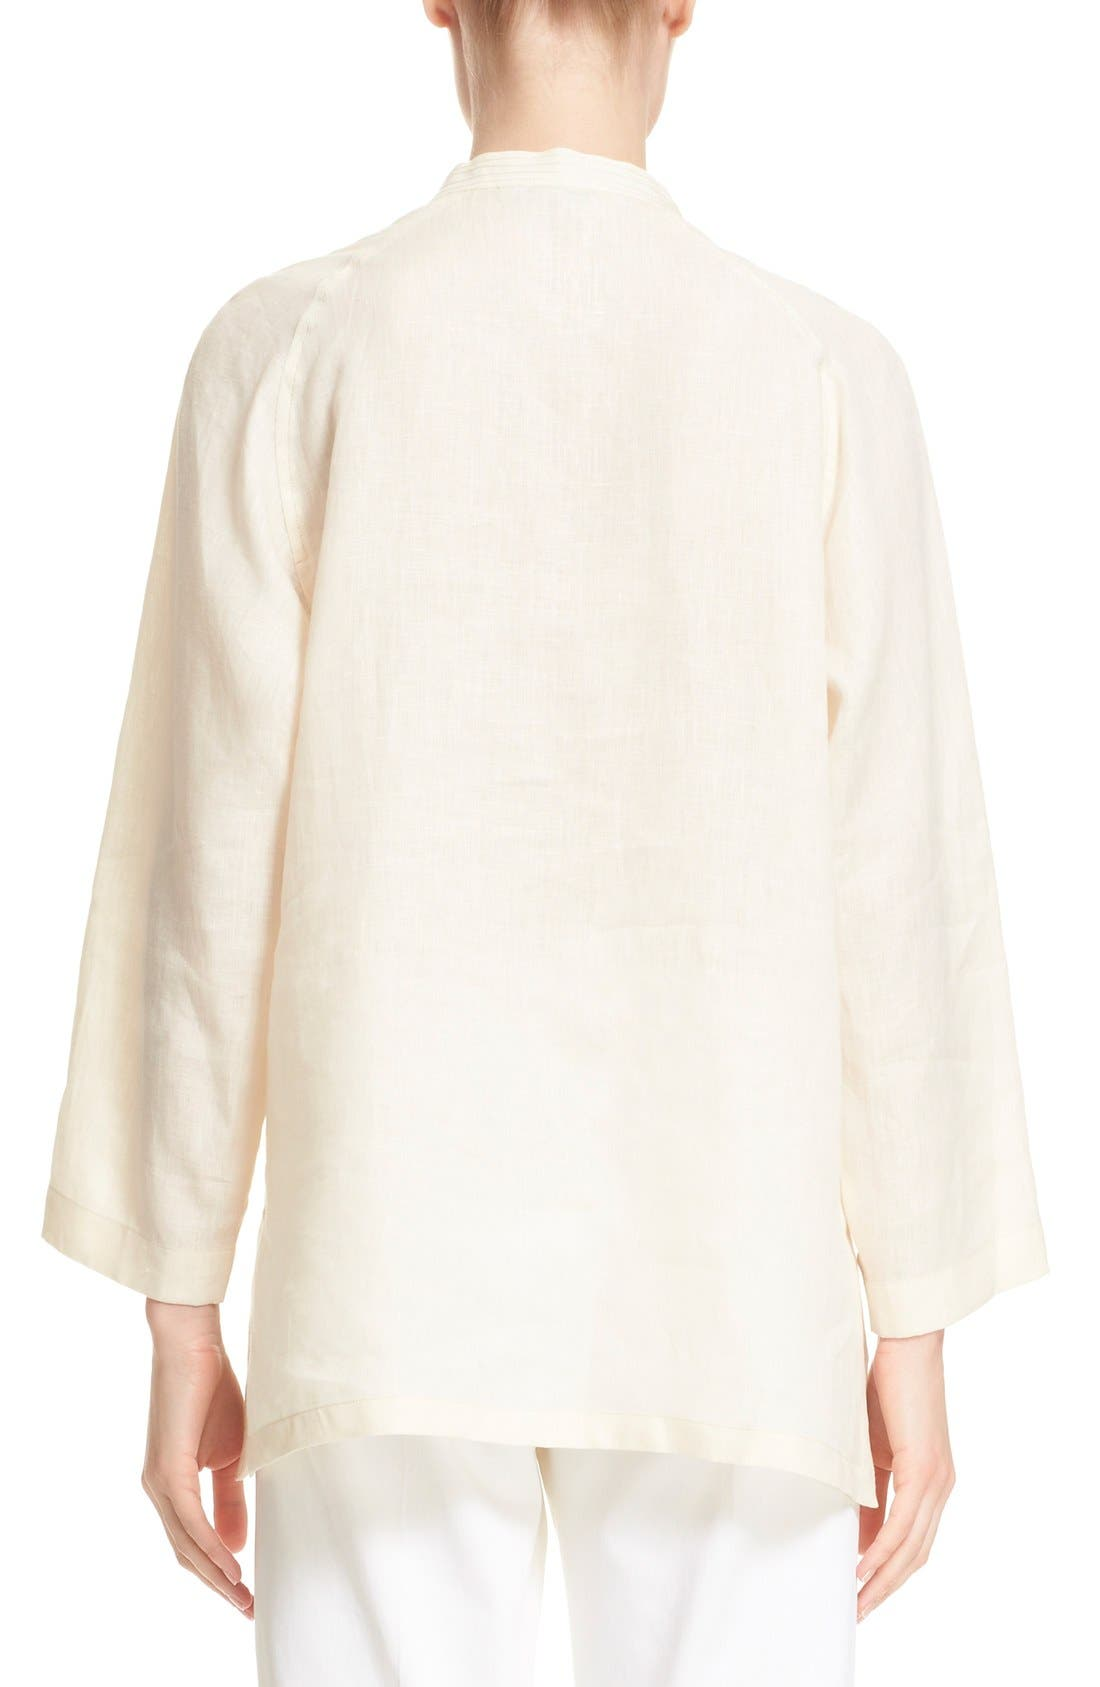 Alternate Image 2  - Max Mara 'Picchio' Linen Blouse